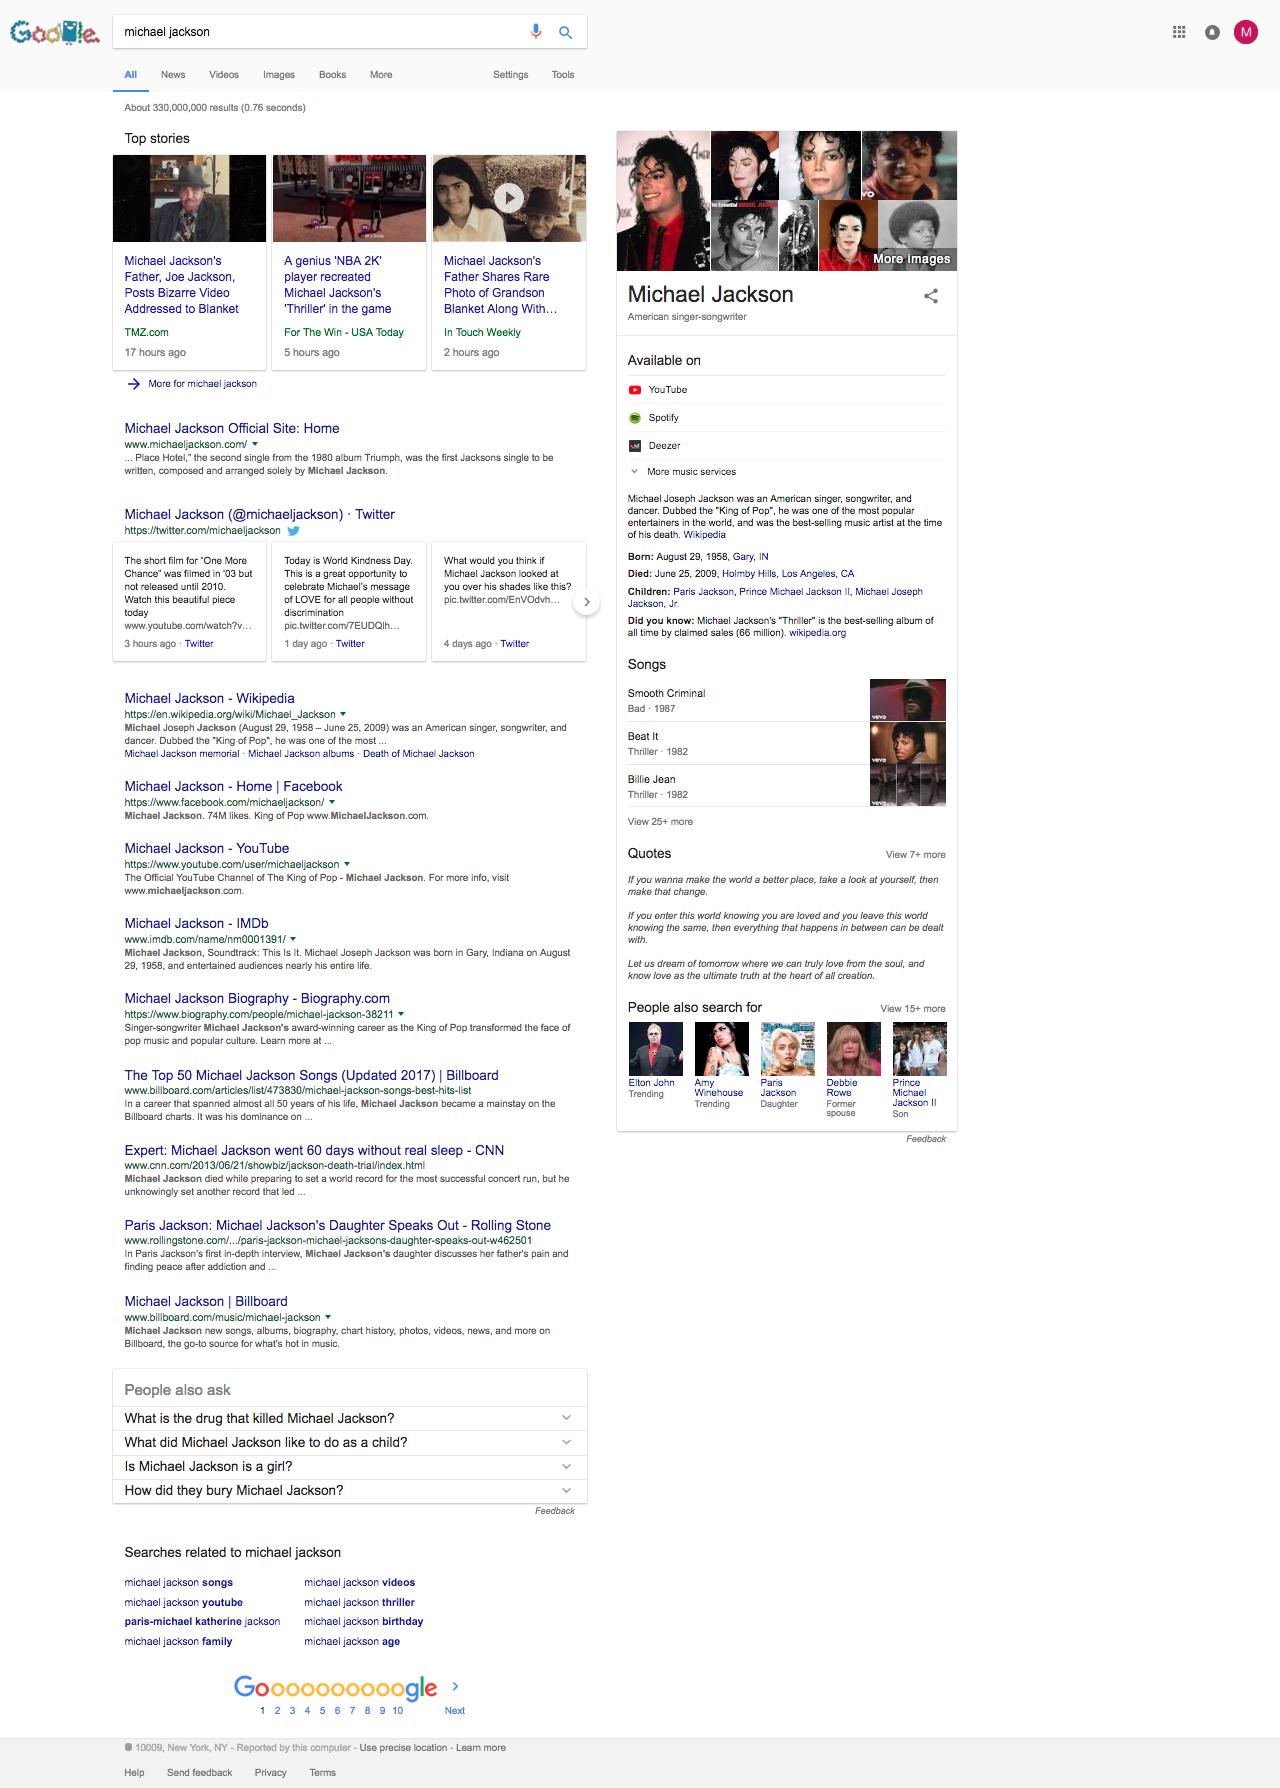 Michael Jackson Google Knowledge Graph